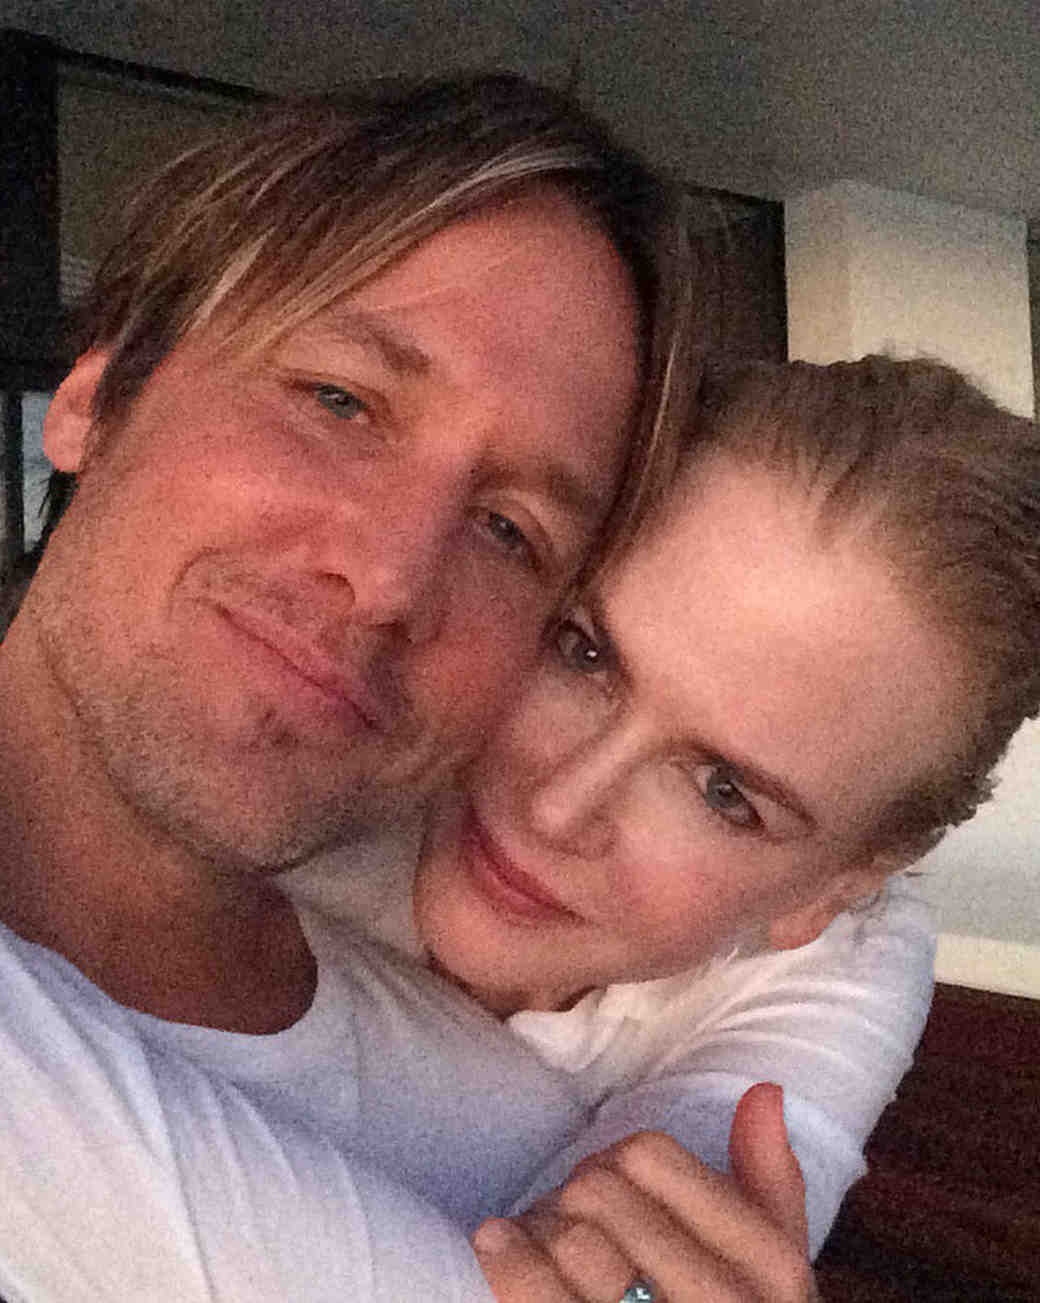 Keith Urban and Nicole Kidman celebrate 11 years of marriage